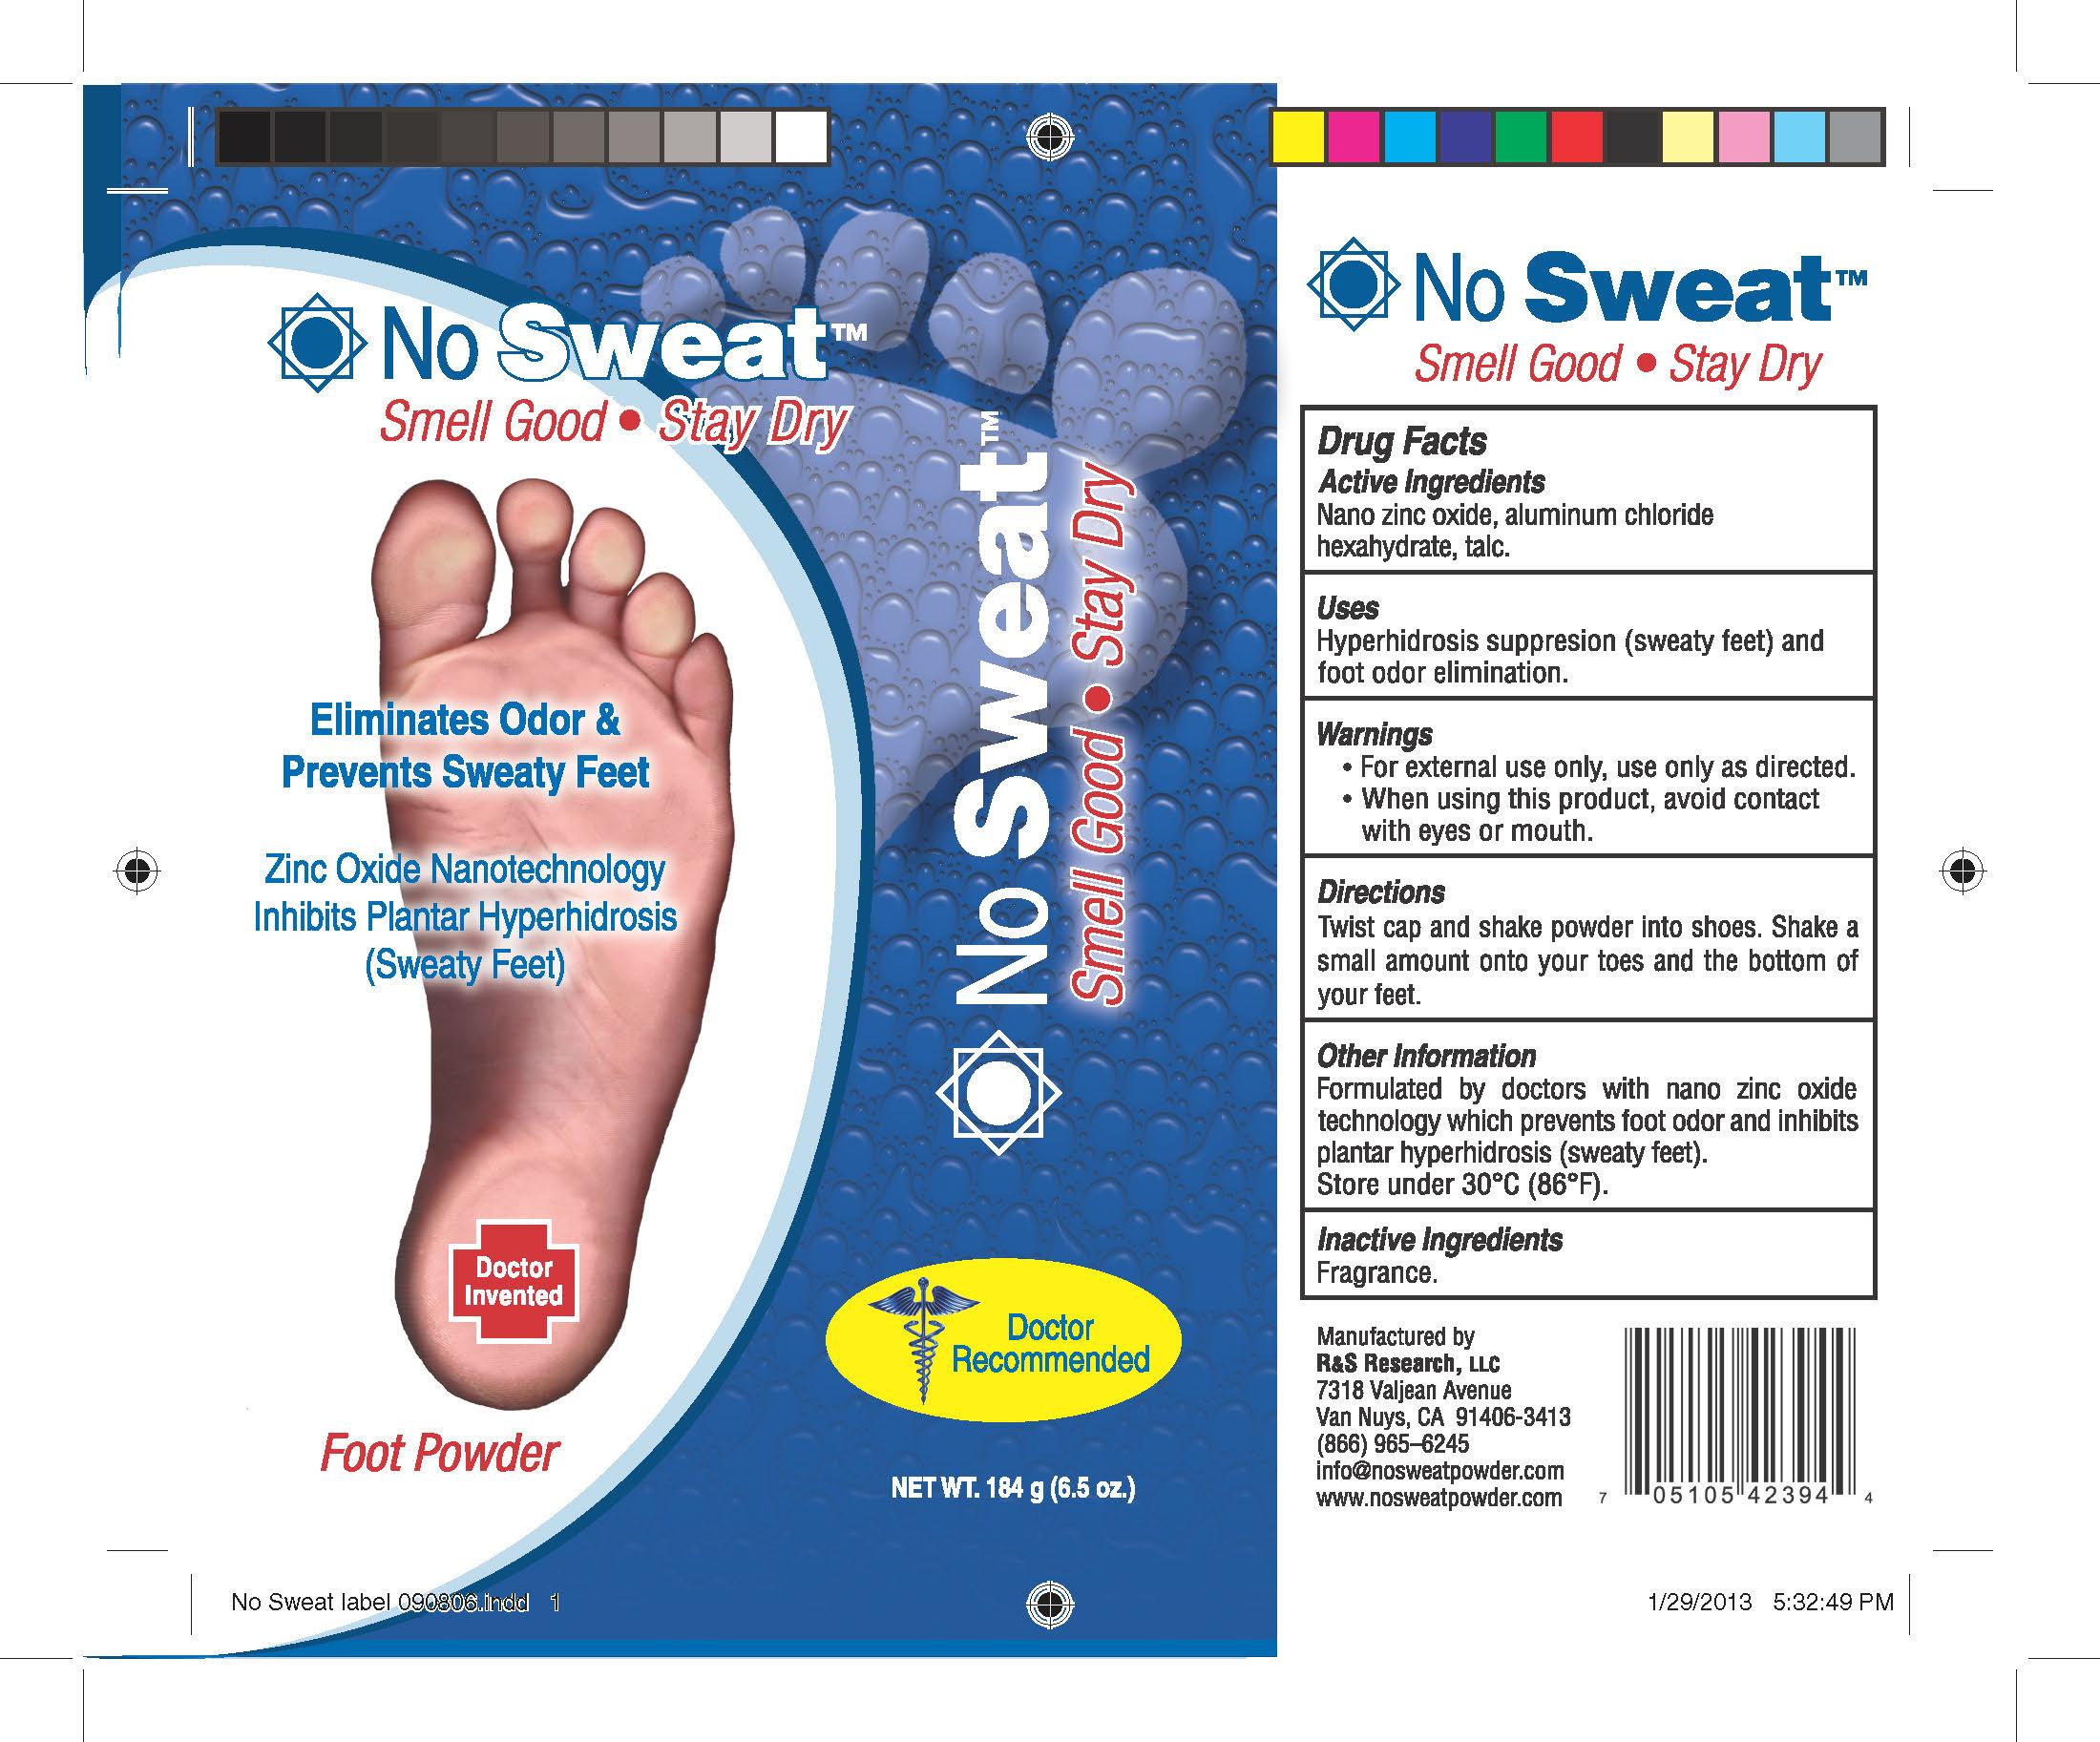 No Sweat Label